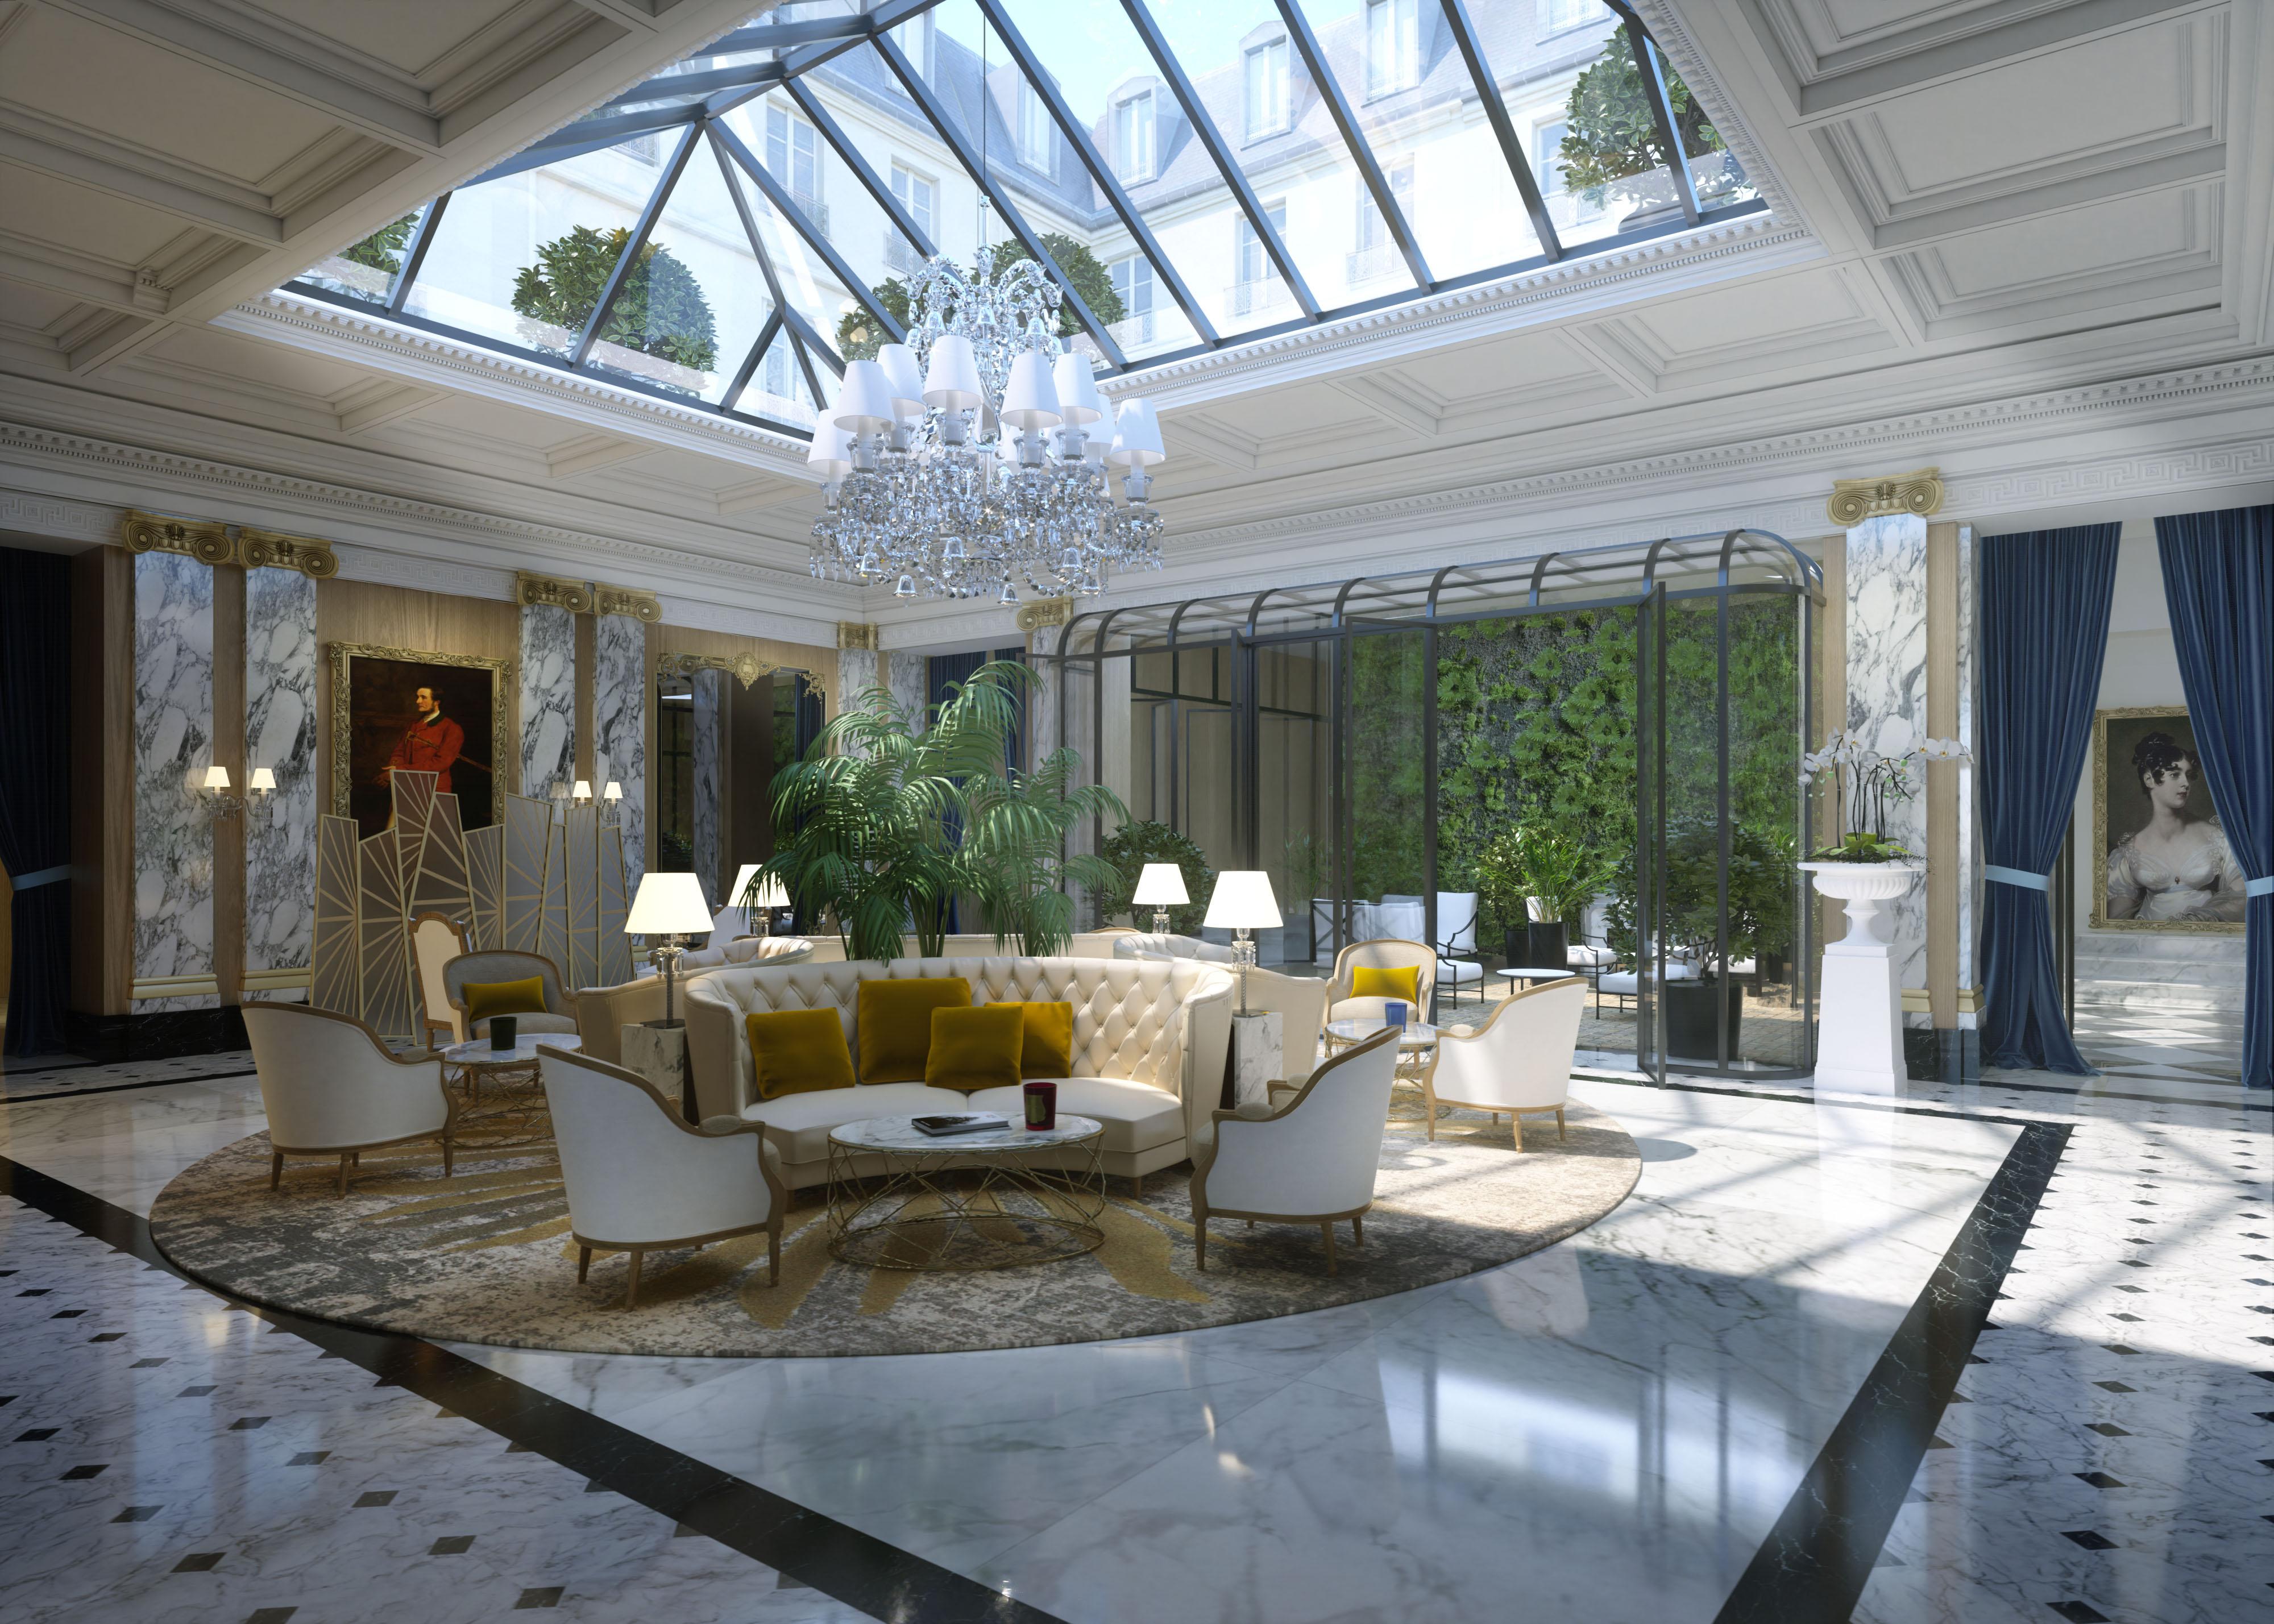 Laurent Maugoust - Hôtel Westminster